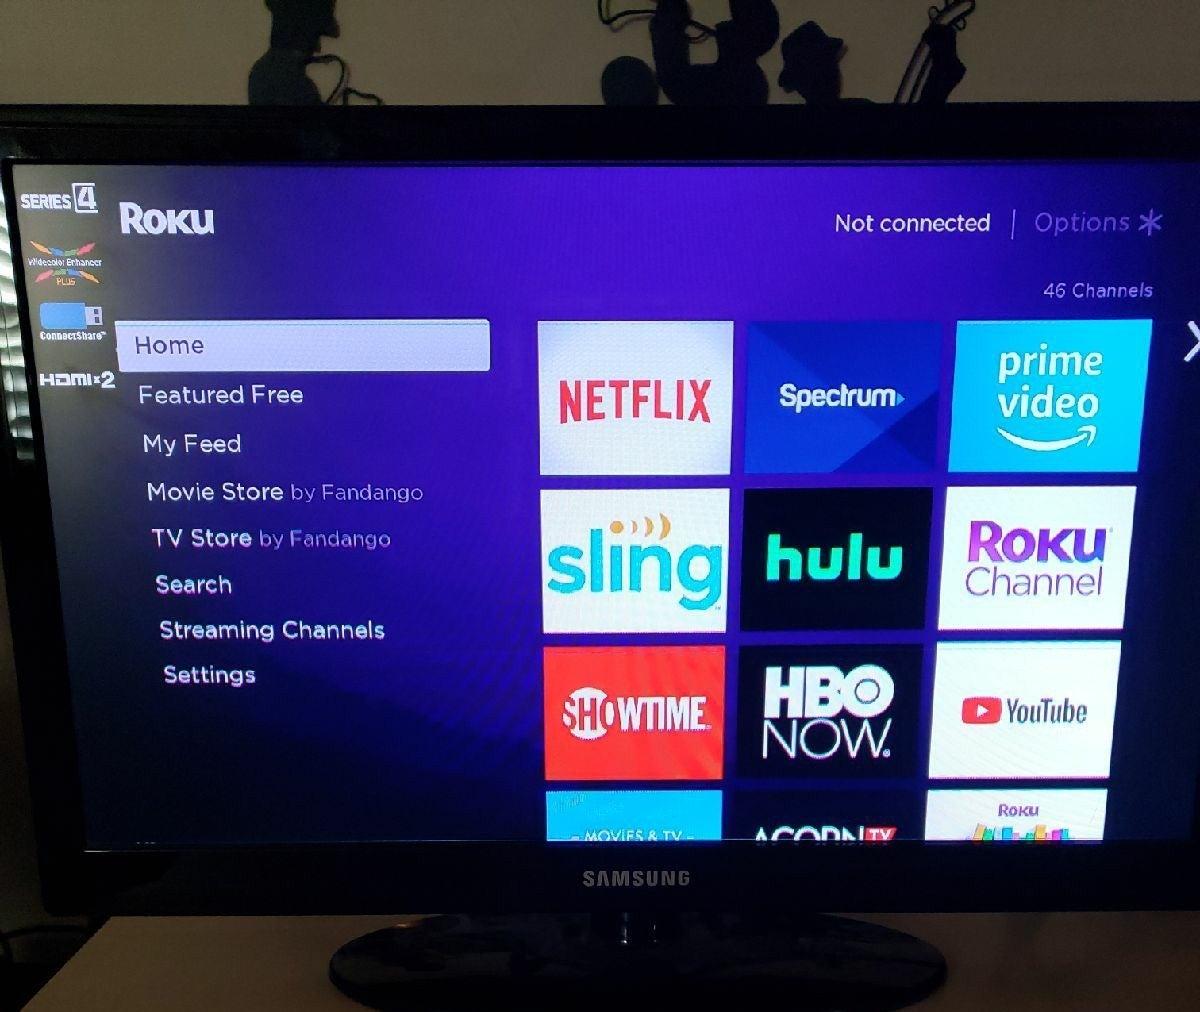 Roku + Samsung 22 inch TV